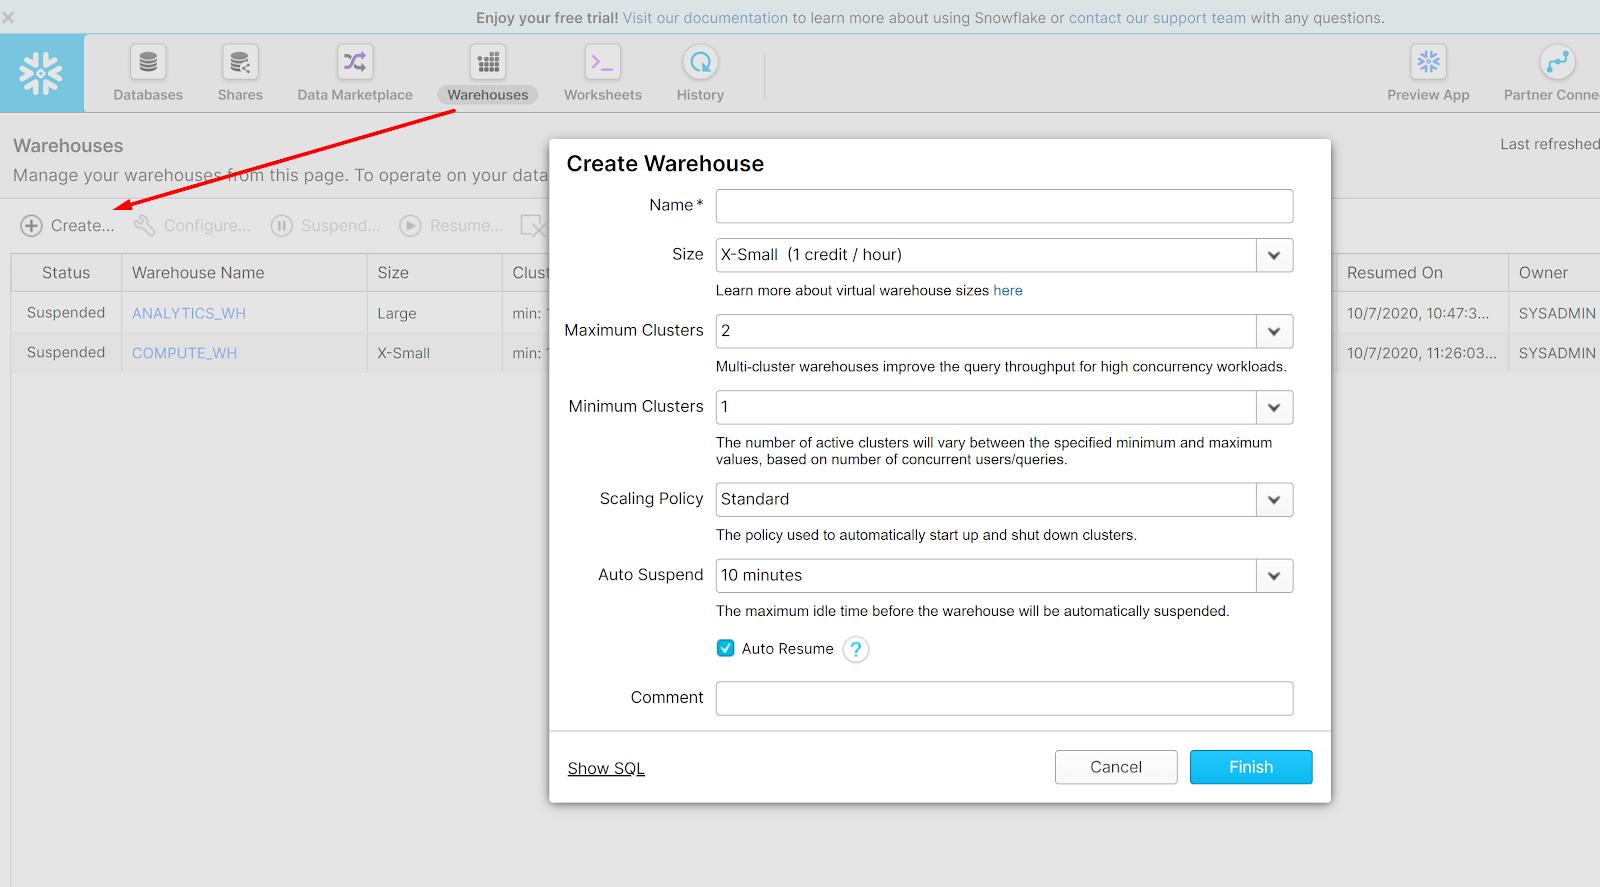 Create your Snowflake warehouse